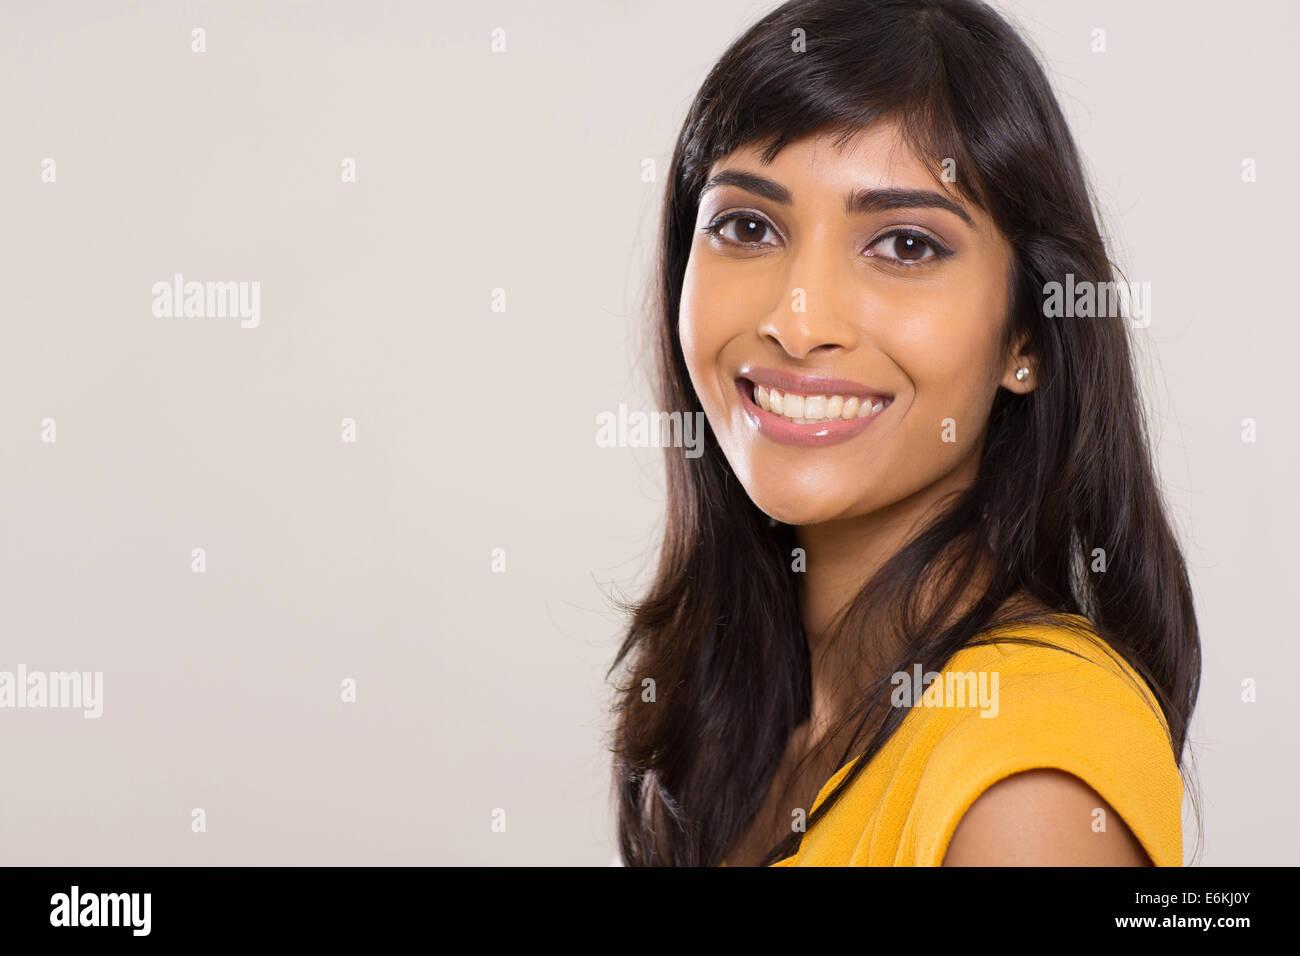 Indian woman beauty shot on plain background - Stock Image